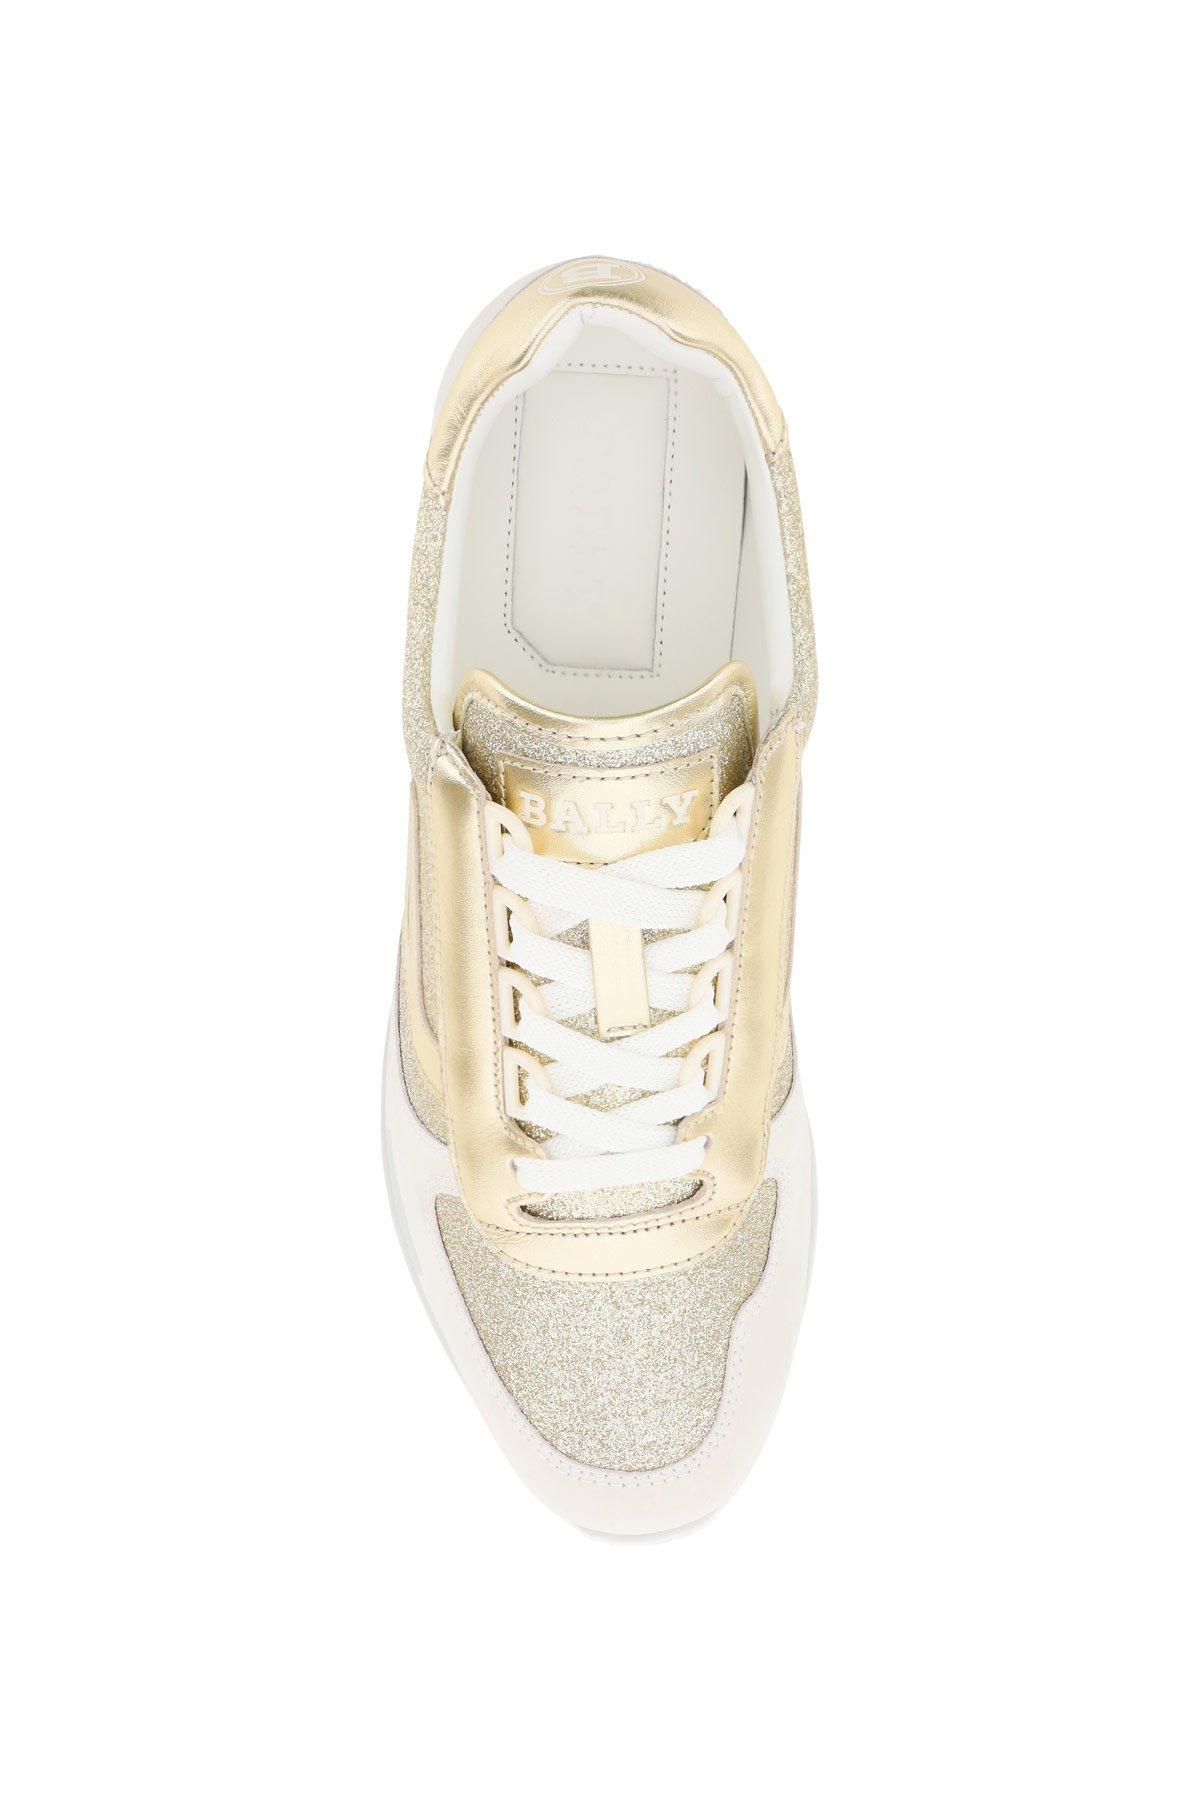 Bally sneakers  gavinia glitter